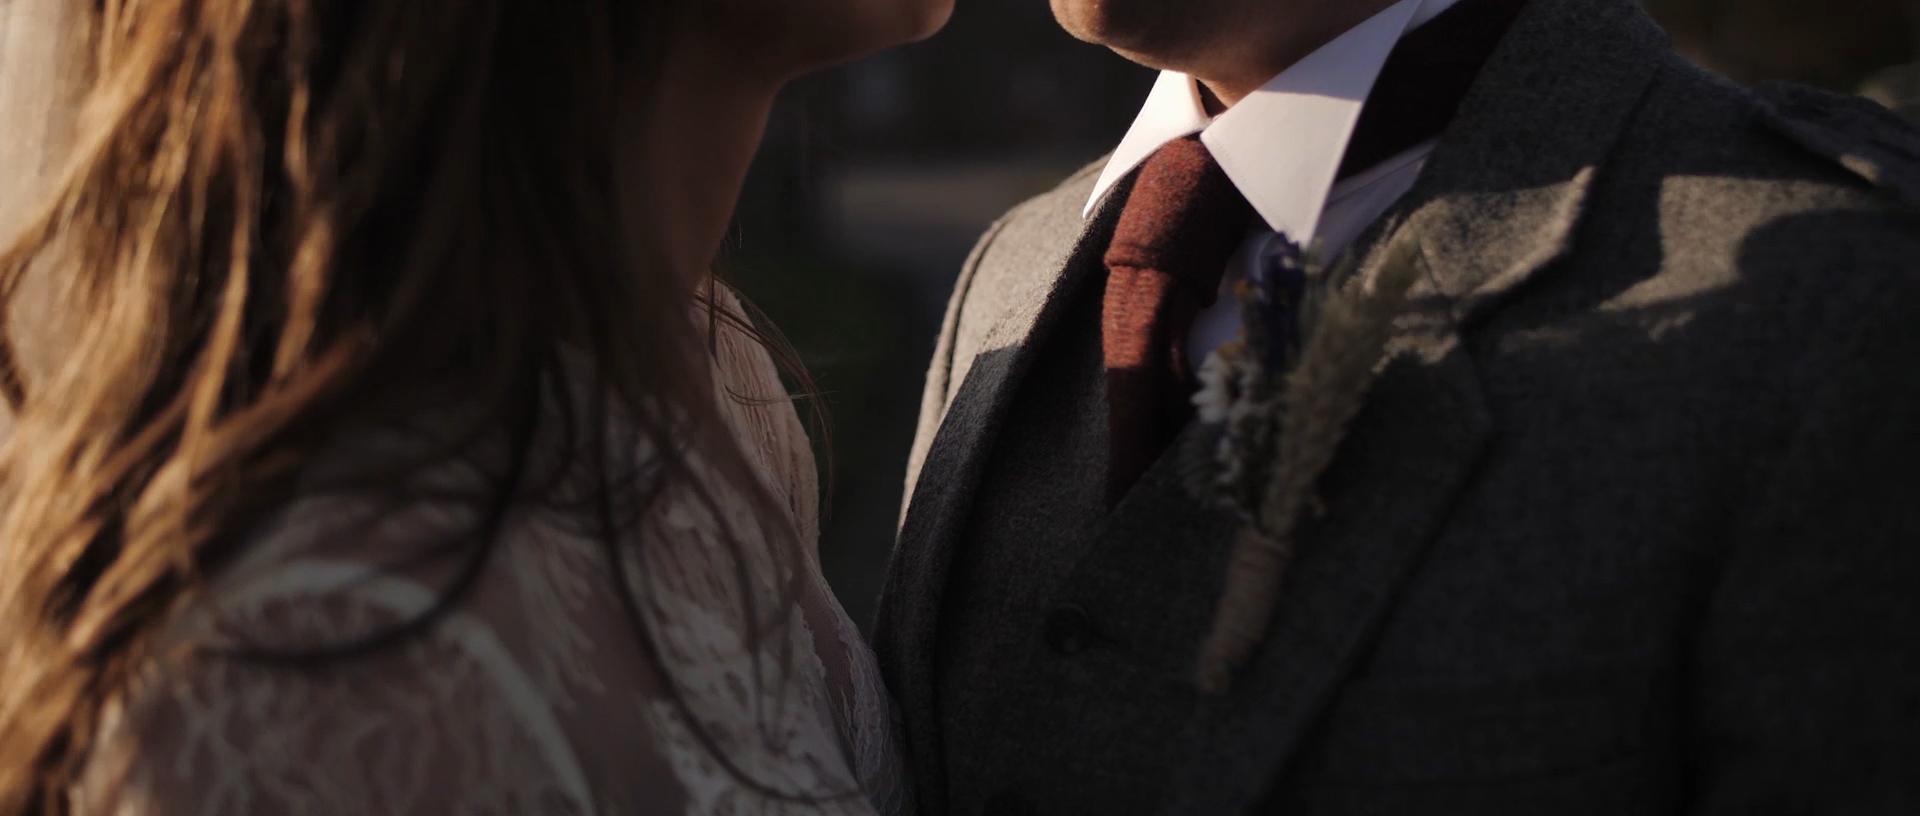 cambo-estate-wedding-videographer_LL_04.jpg